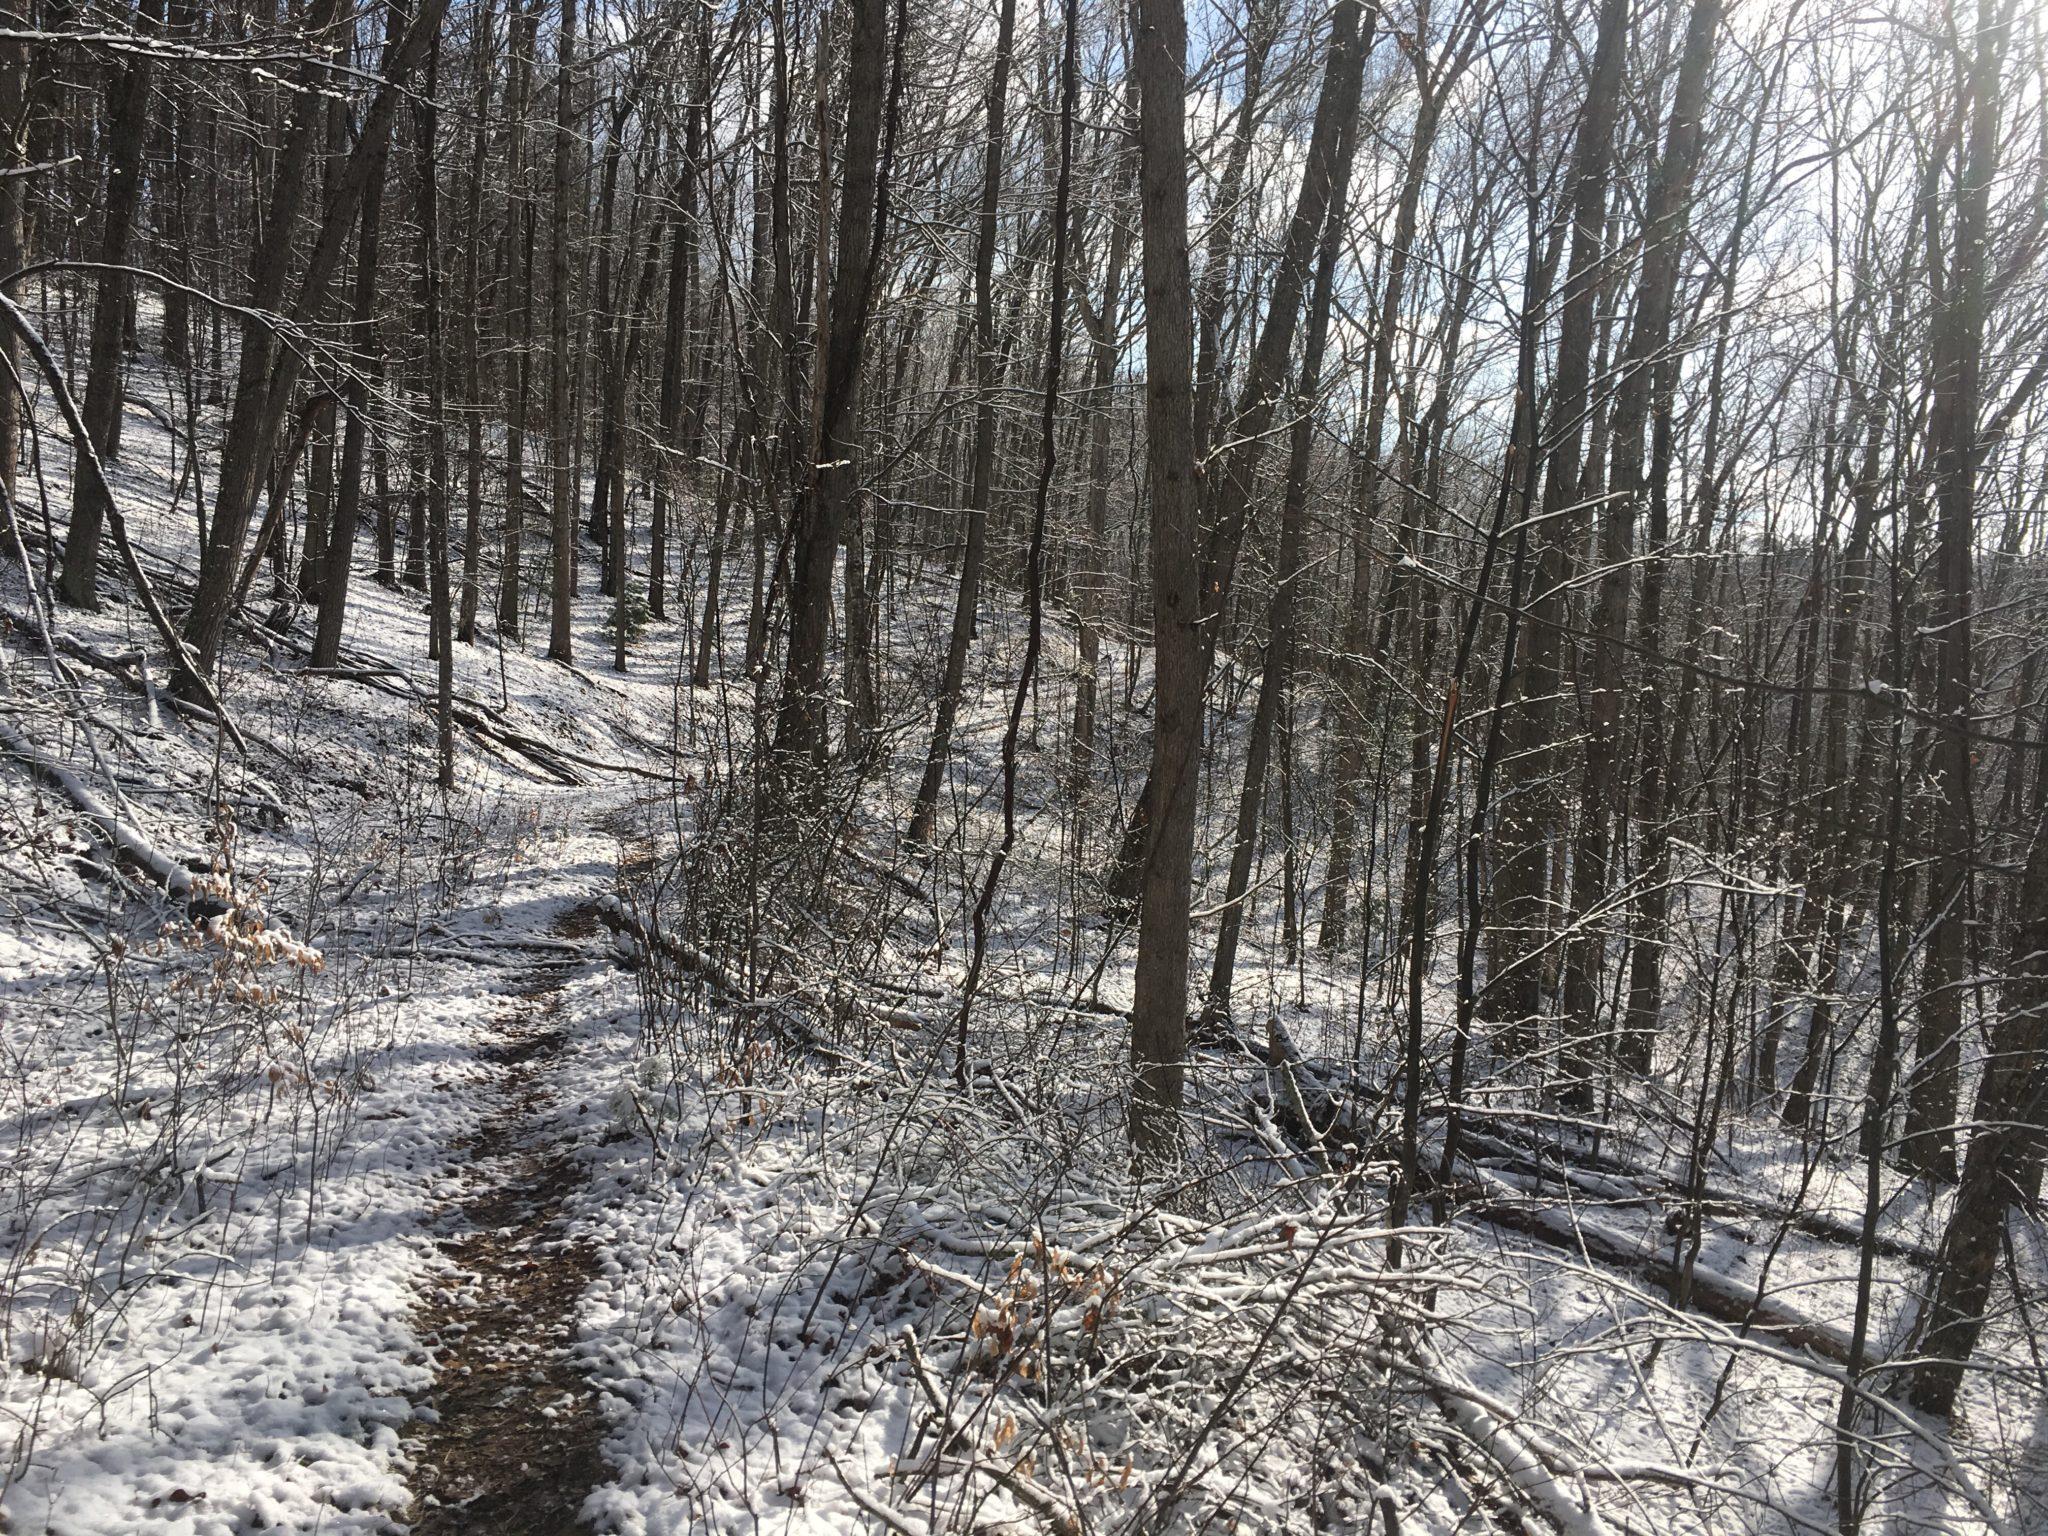 Fresh snow on the ground